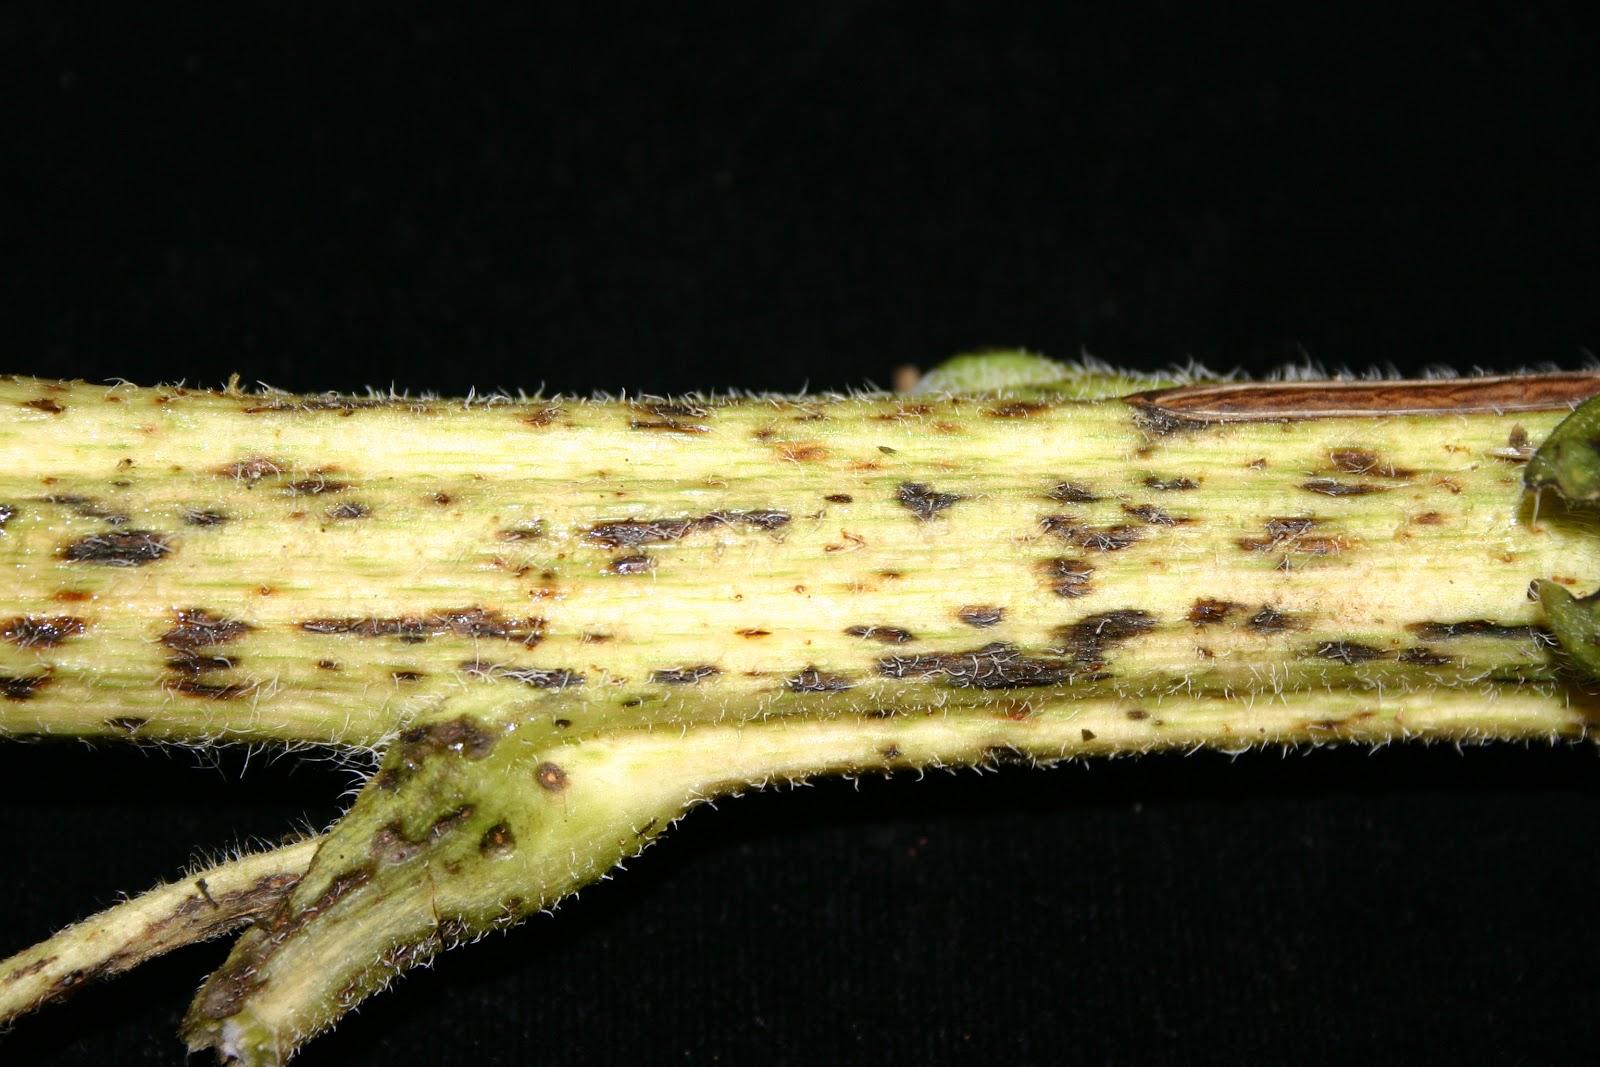 NCSU PDIC: Super Sad Sunflowers: Alternaria leaf and stem spot